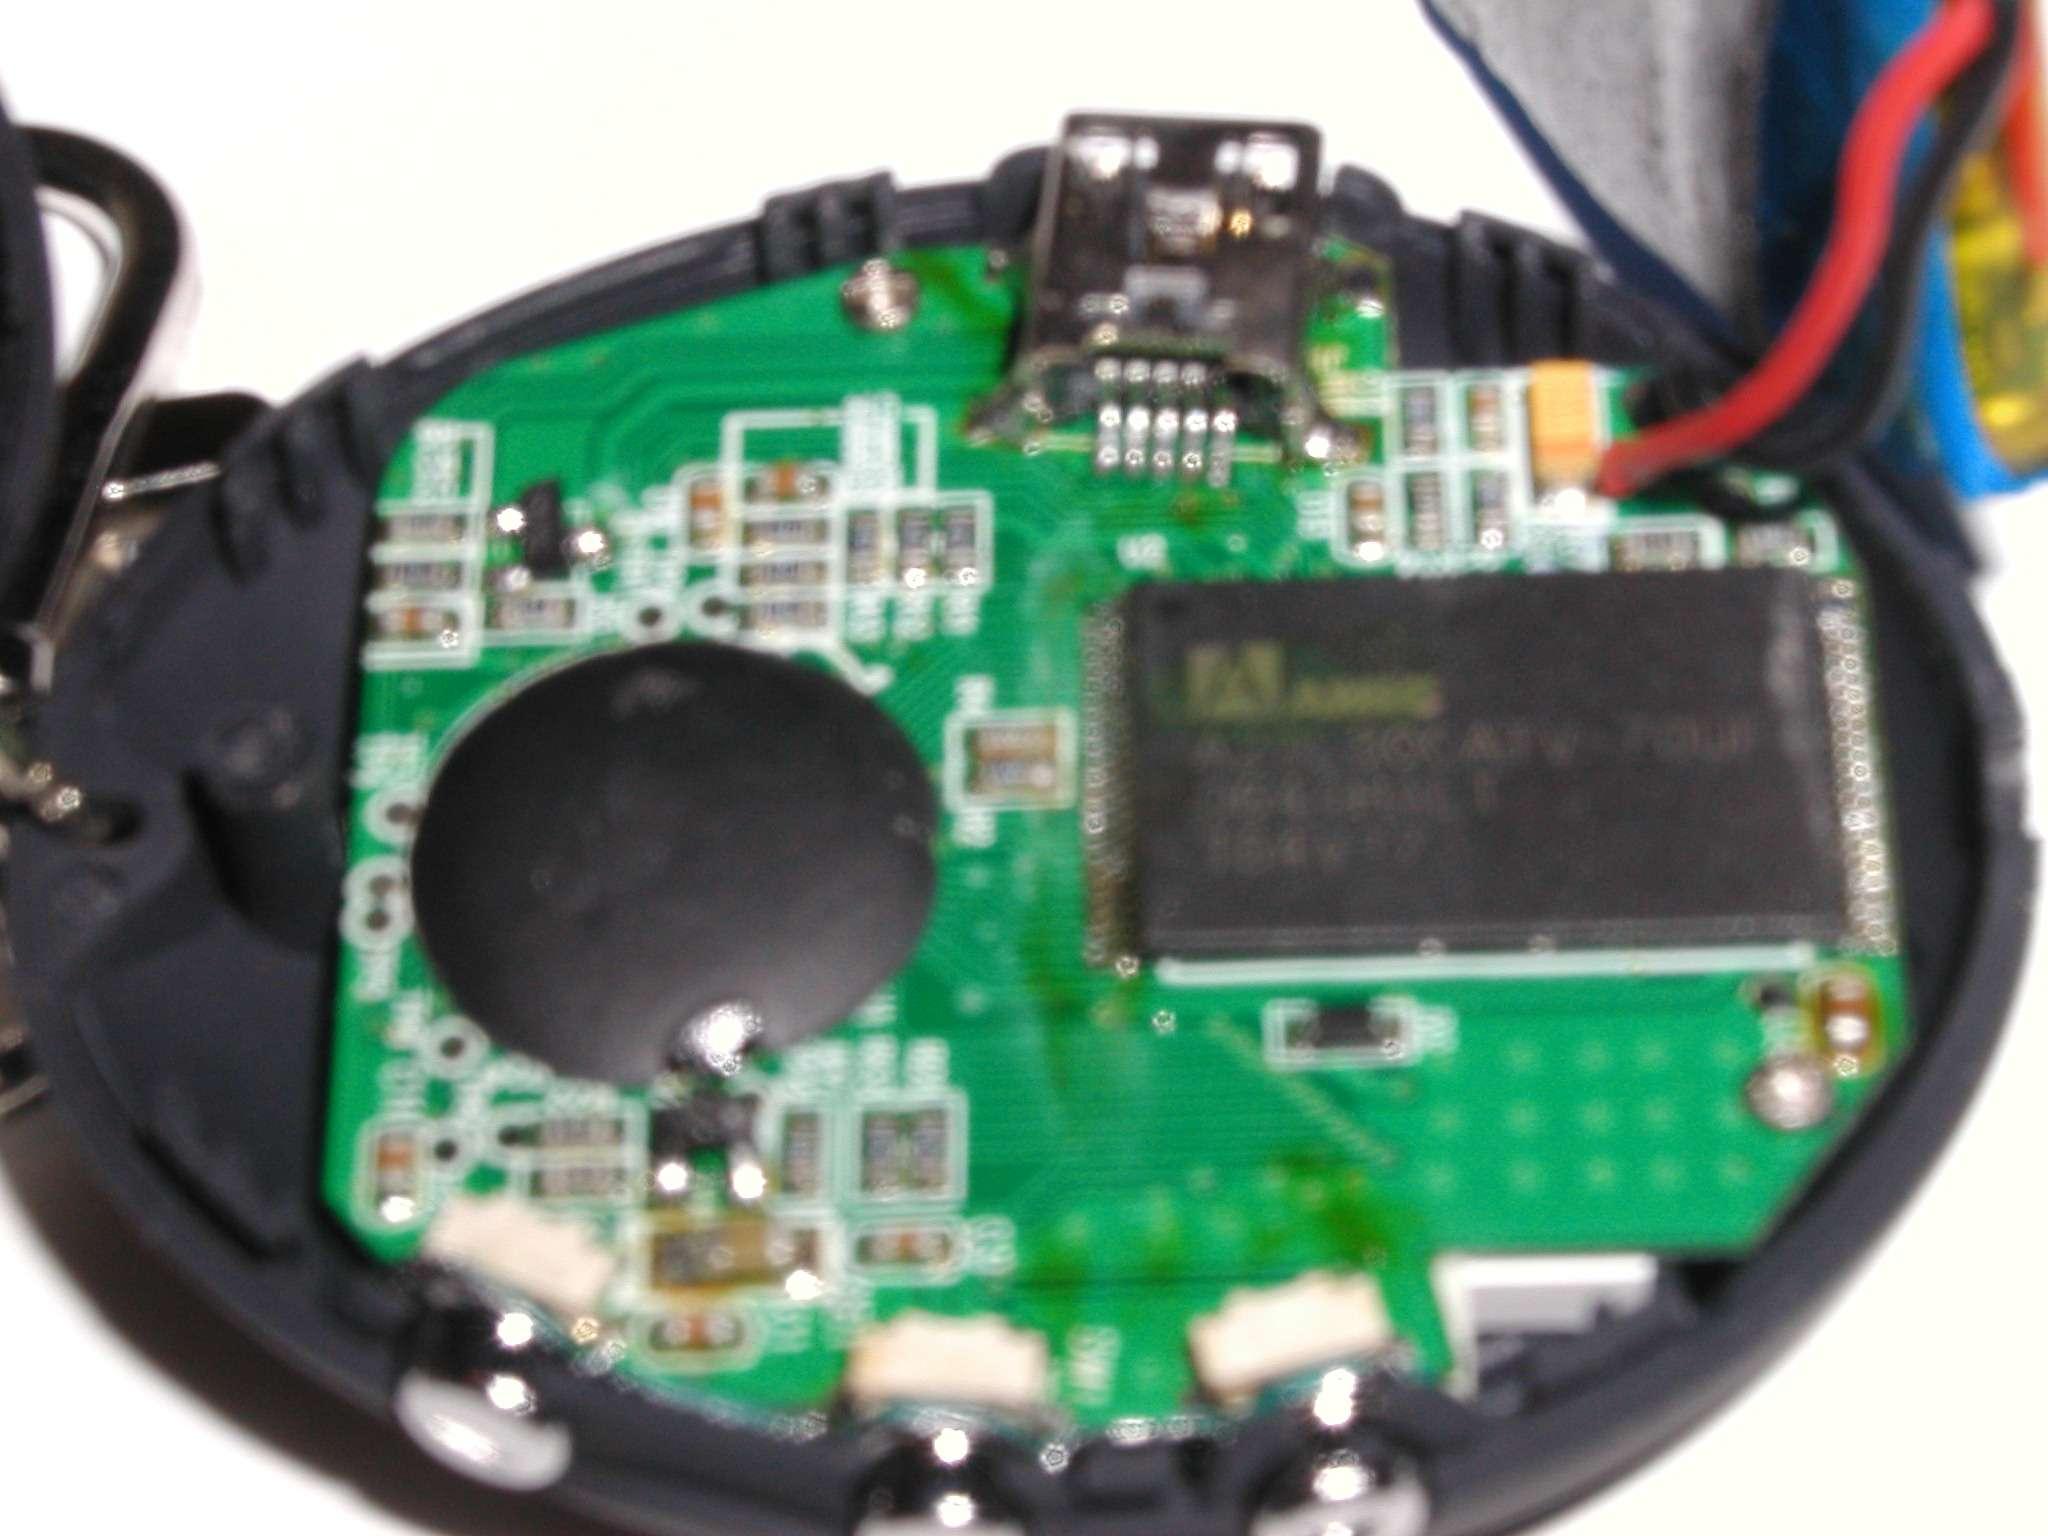 SITRONIX MULTIMEDIA USB DEVICE WINDOWS 7 X64 DRIVER DOWNLOAD